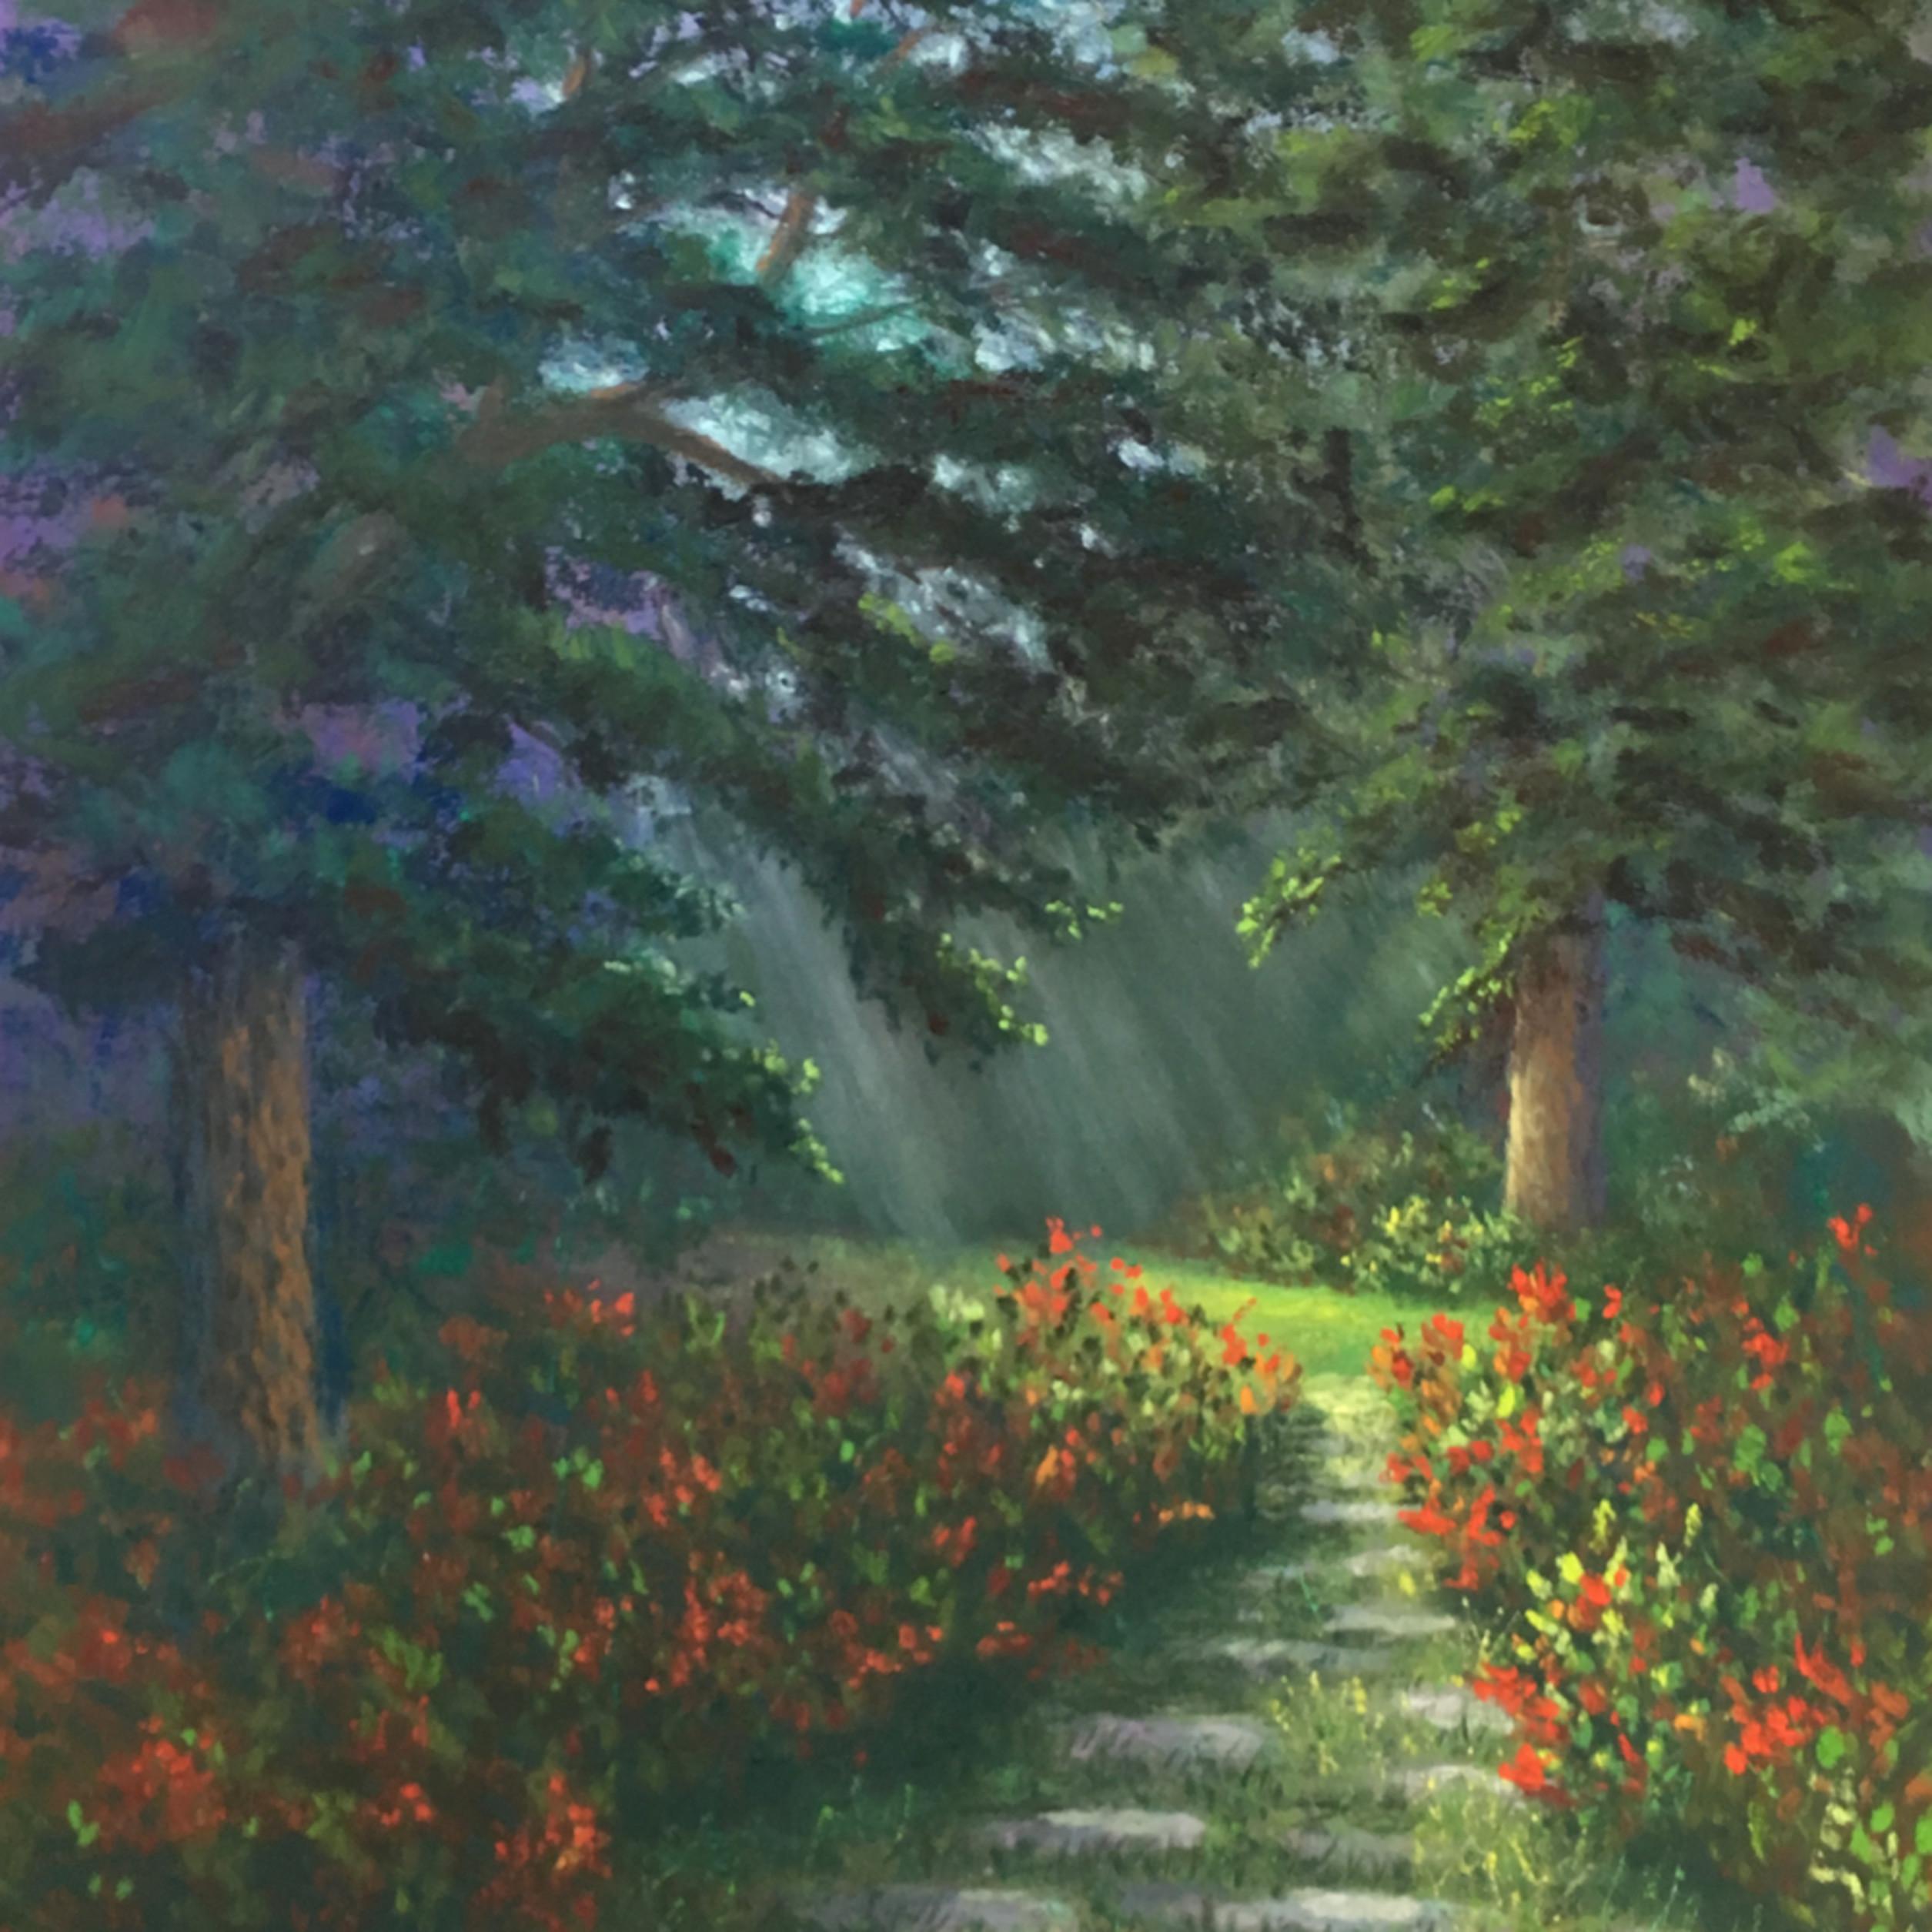 Glowing garden path u3pbkl